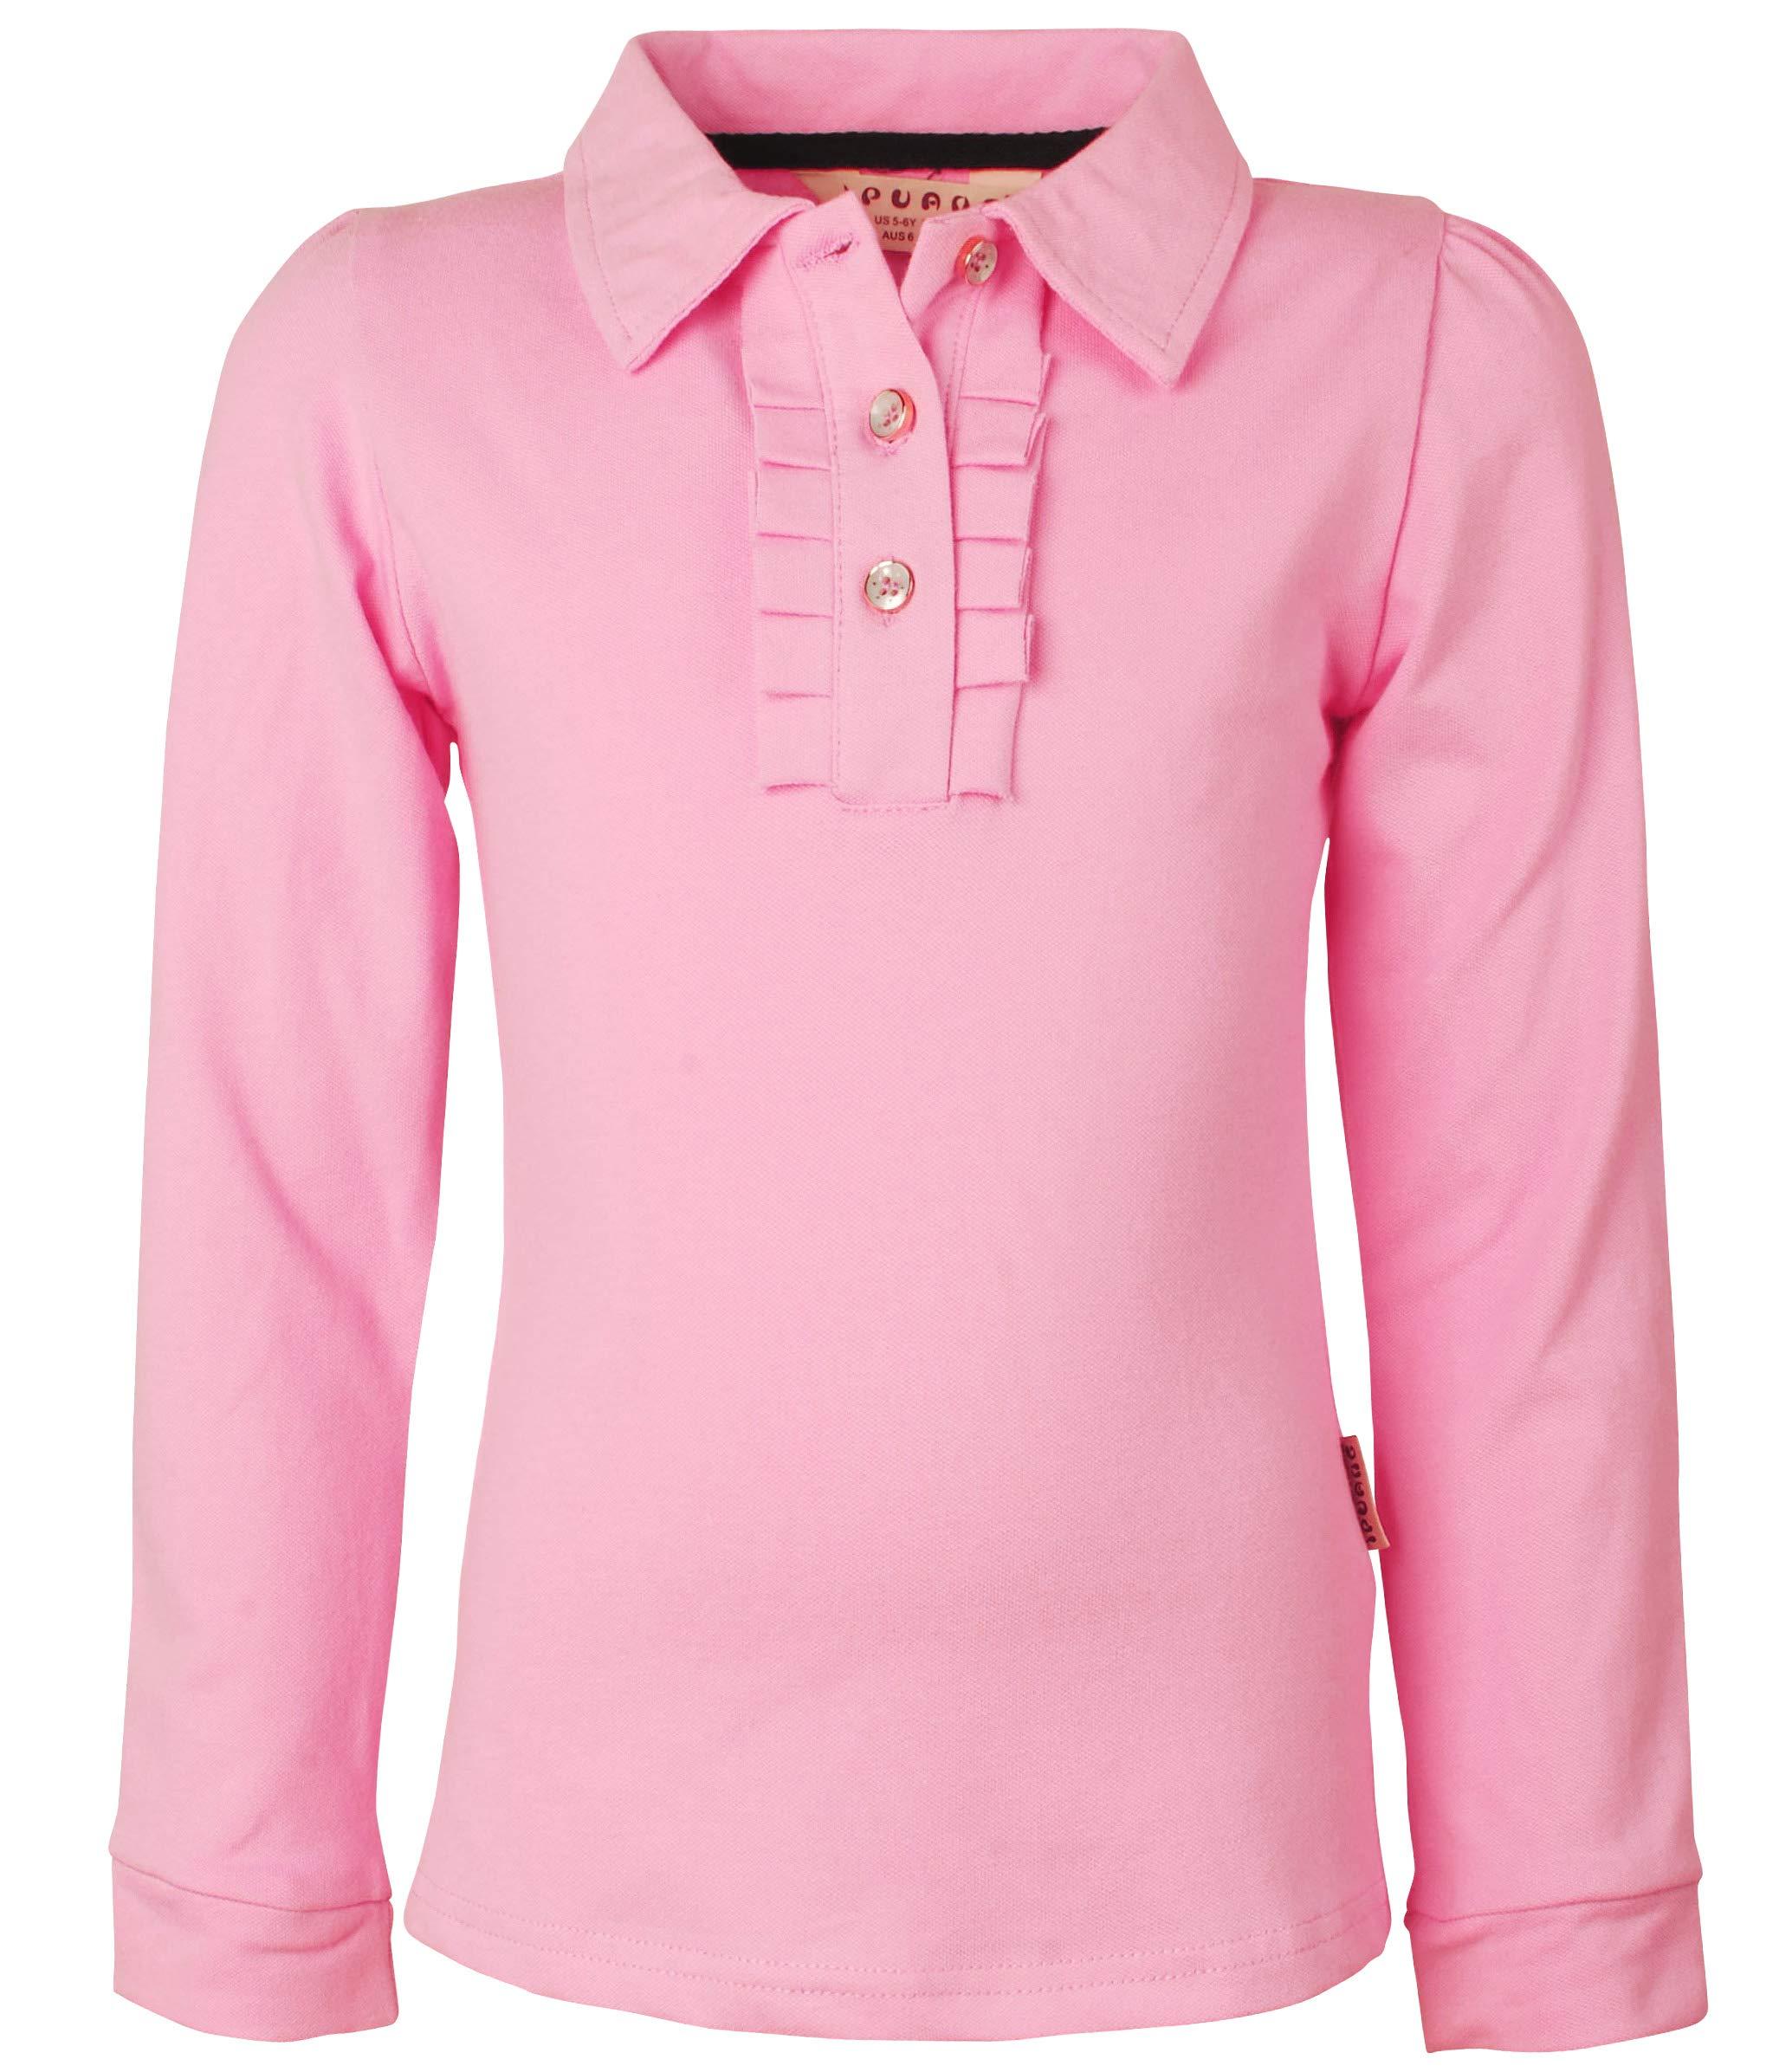 Ipuang Little Girl Long Sleeve Cotton Ruffle Polo Shirt Top 6 Pink